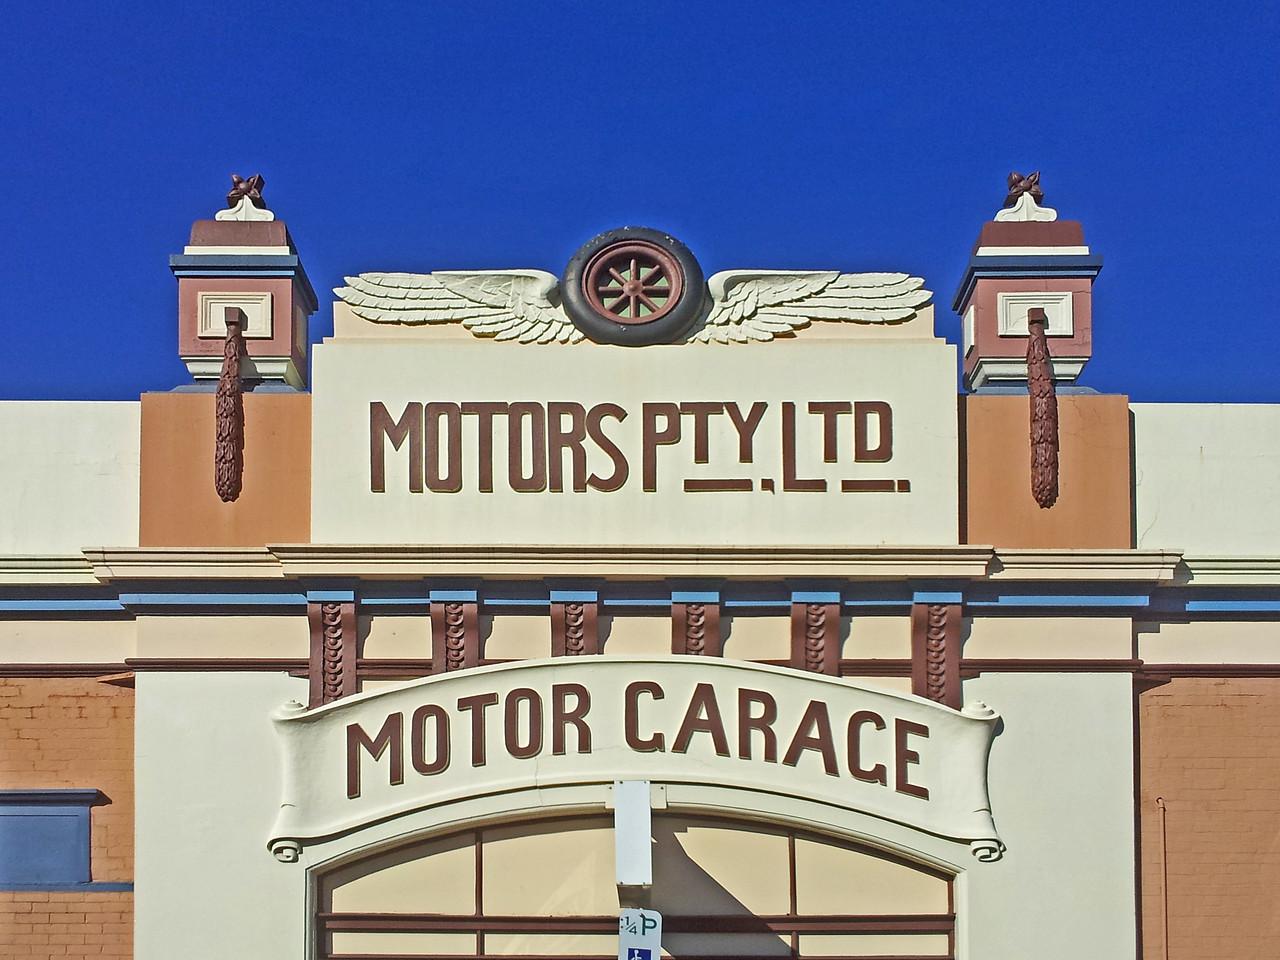 Motors Pty Ltd Motor Garage, Brisbane Street, Launceston, Tasmania.